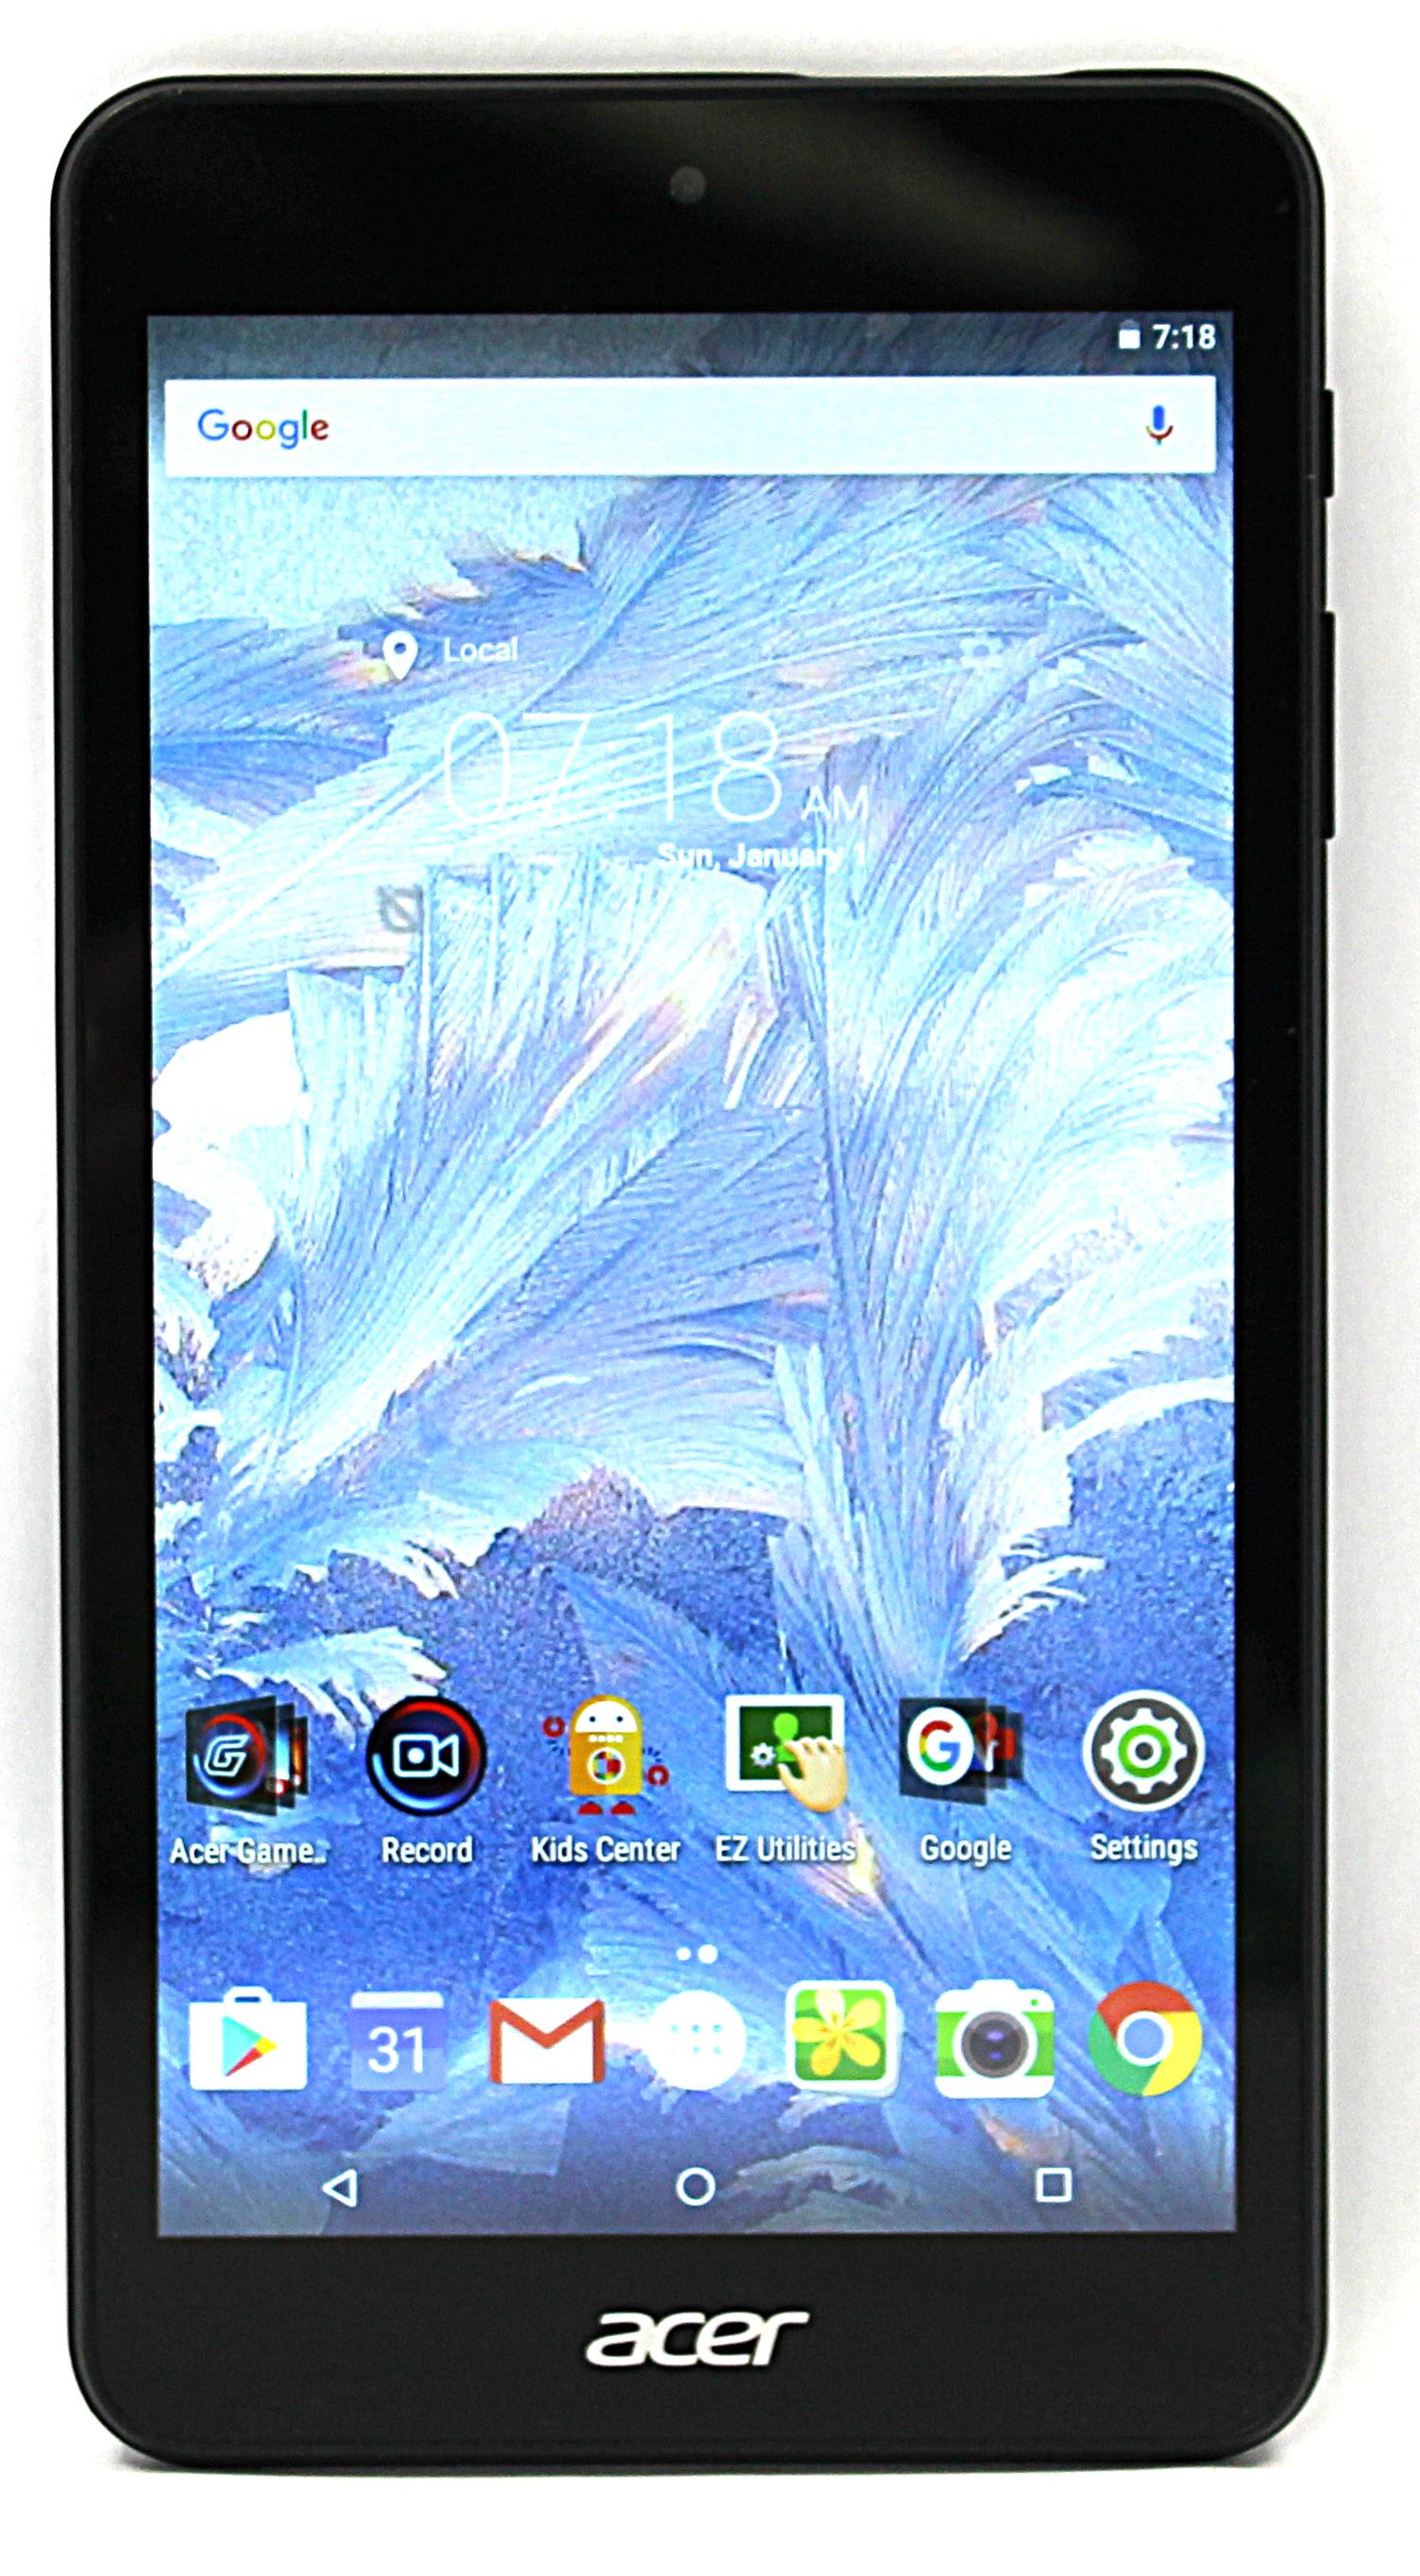 "Acer Iconia One 7"" 16GB Tablet Model: B1-790 - WiFi - Black - Refurbished"